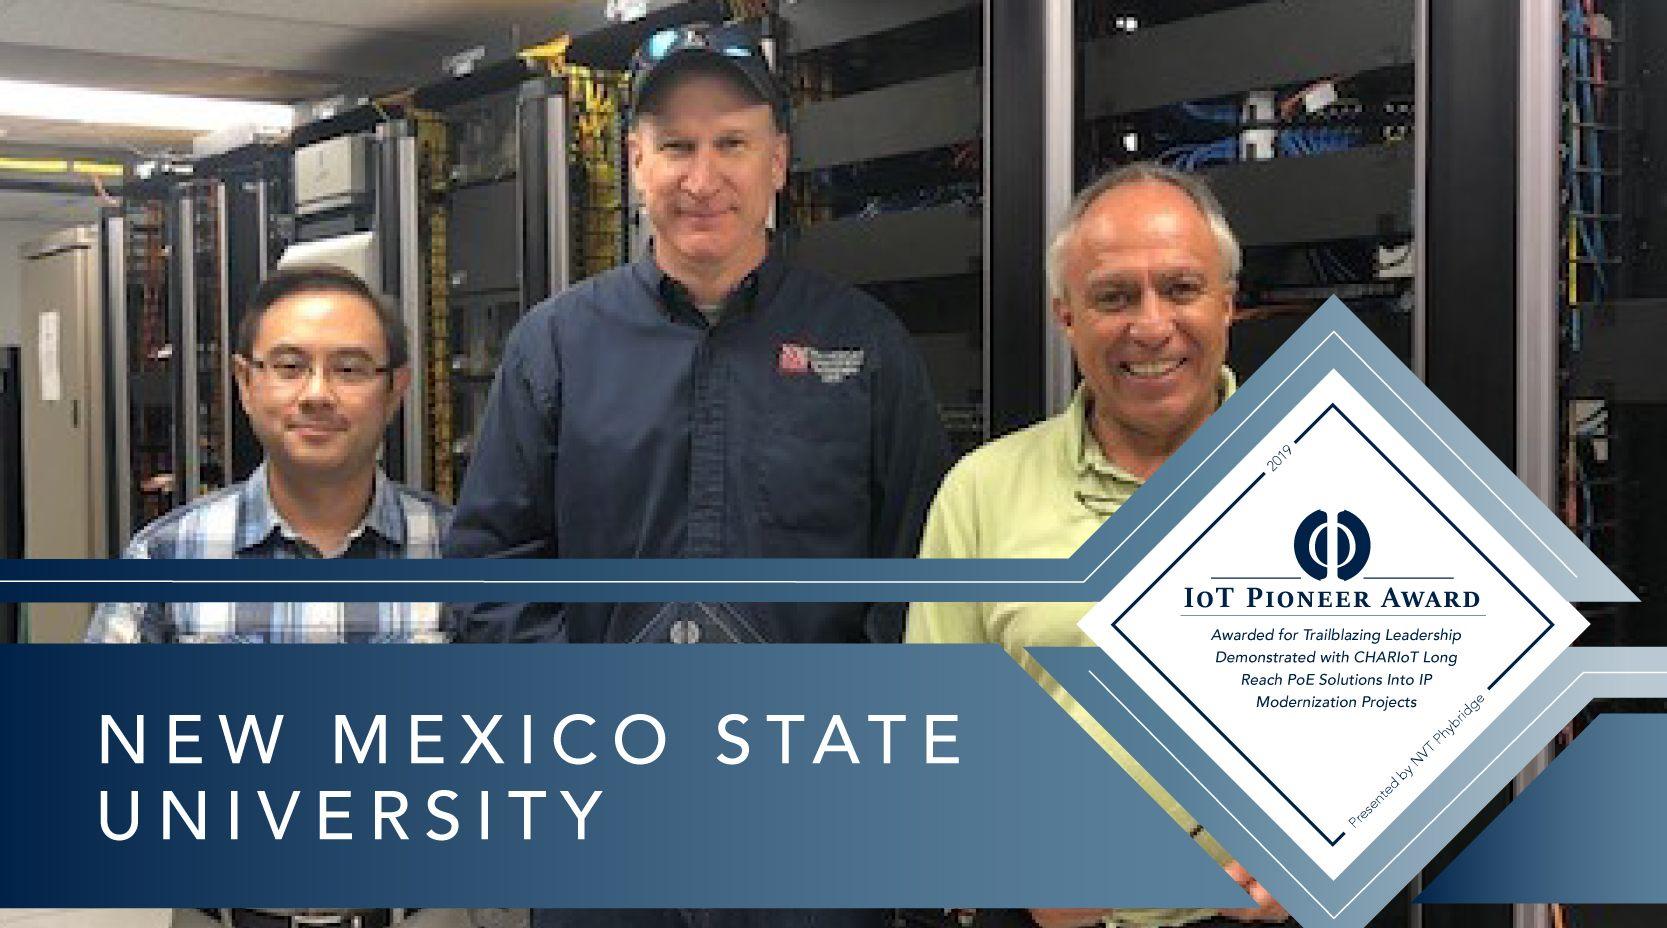 Nmsu Communication Team Wins The Nvt Phybridge Iot Pioneer Award